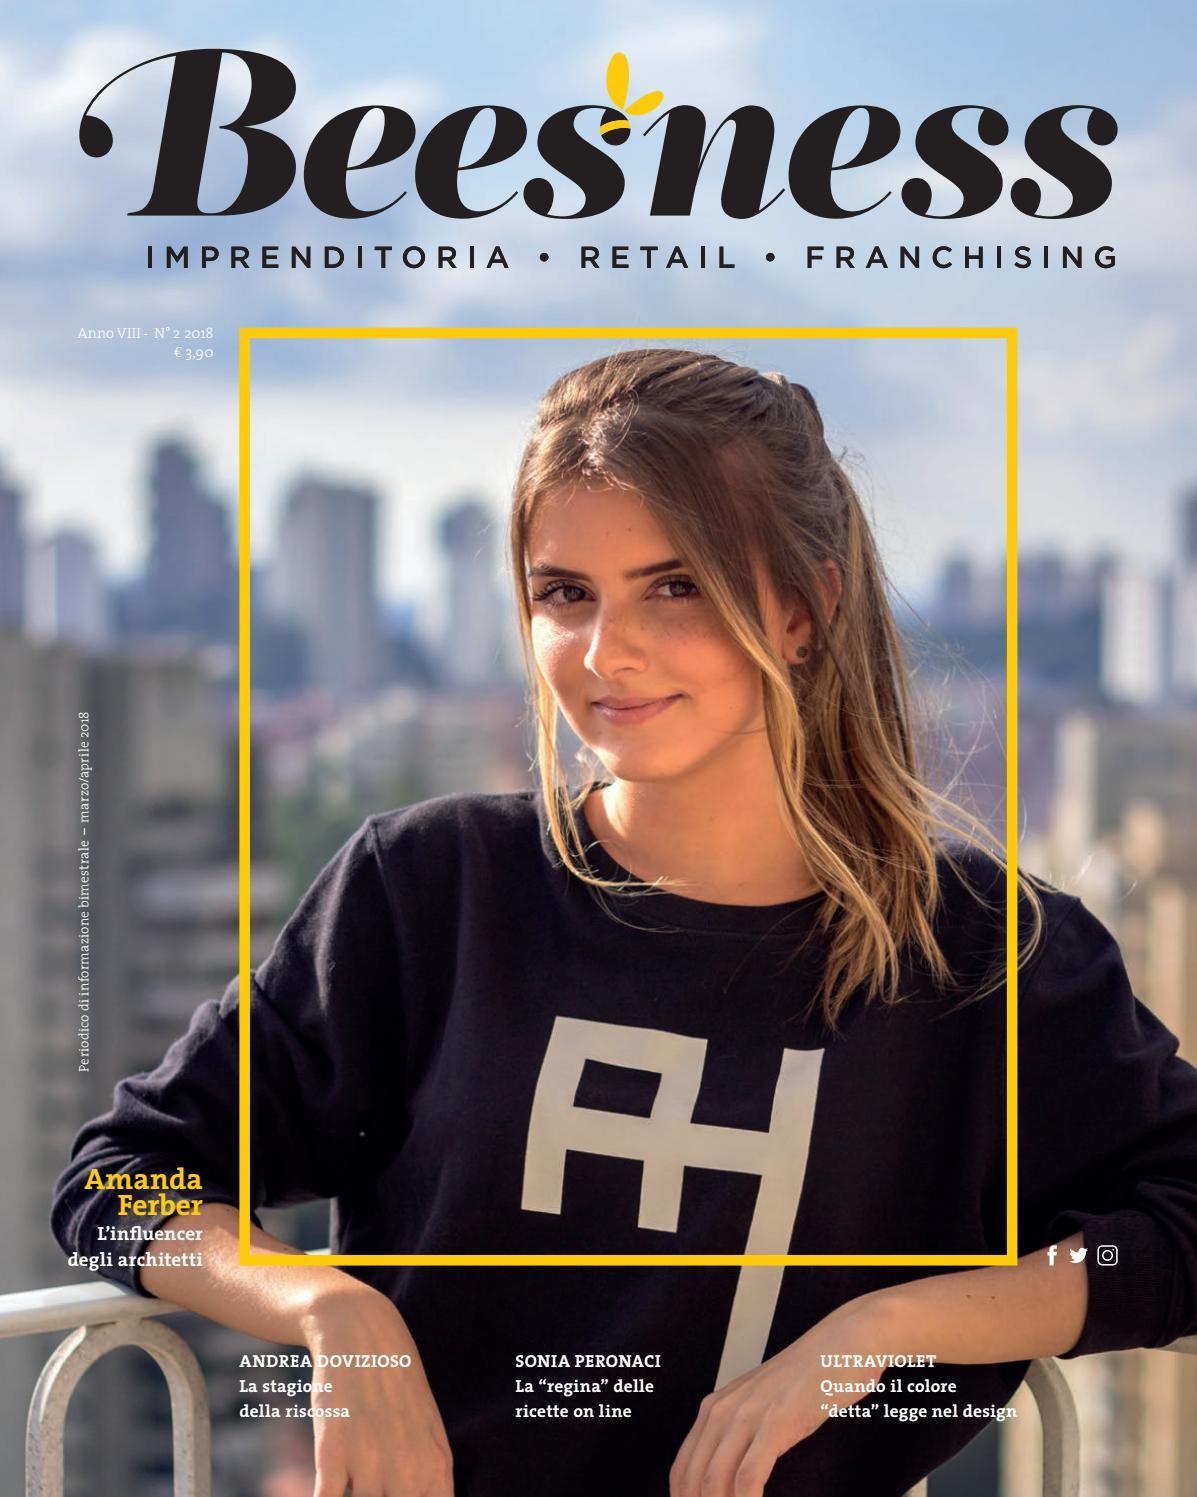 Beesness n.2-18 - Amanda Ferber by Beesness - issuu 29384e3c33a